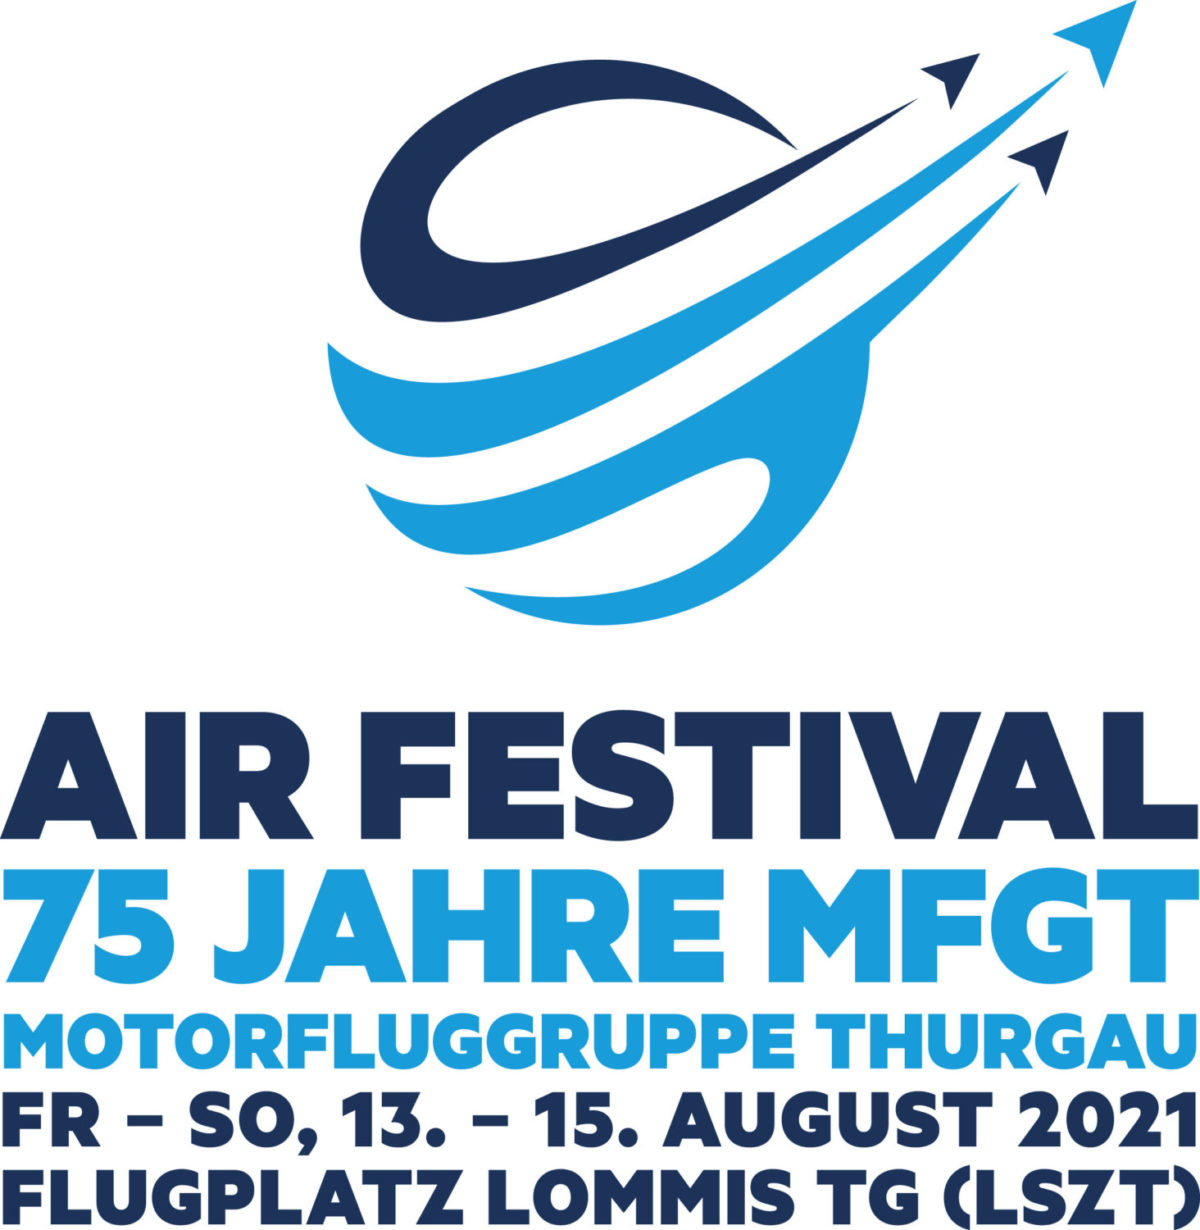 Air Festival 2021 der Motorfluggruppe Thurgau